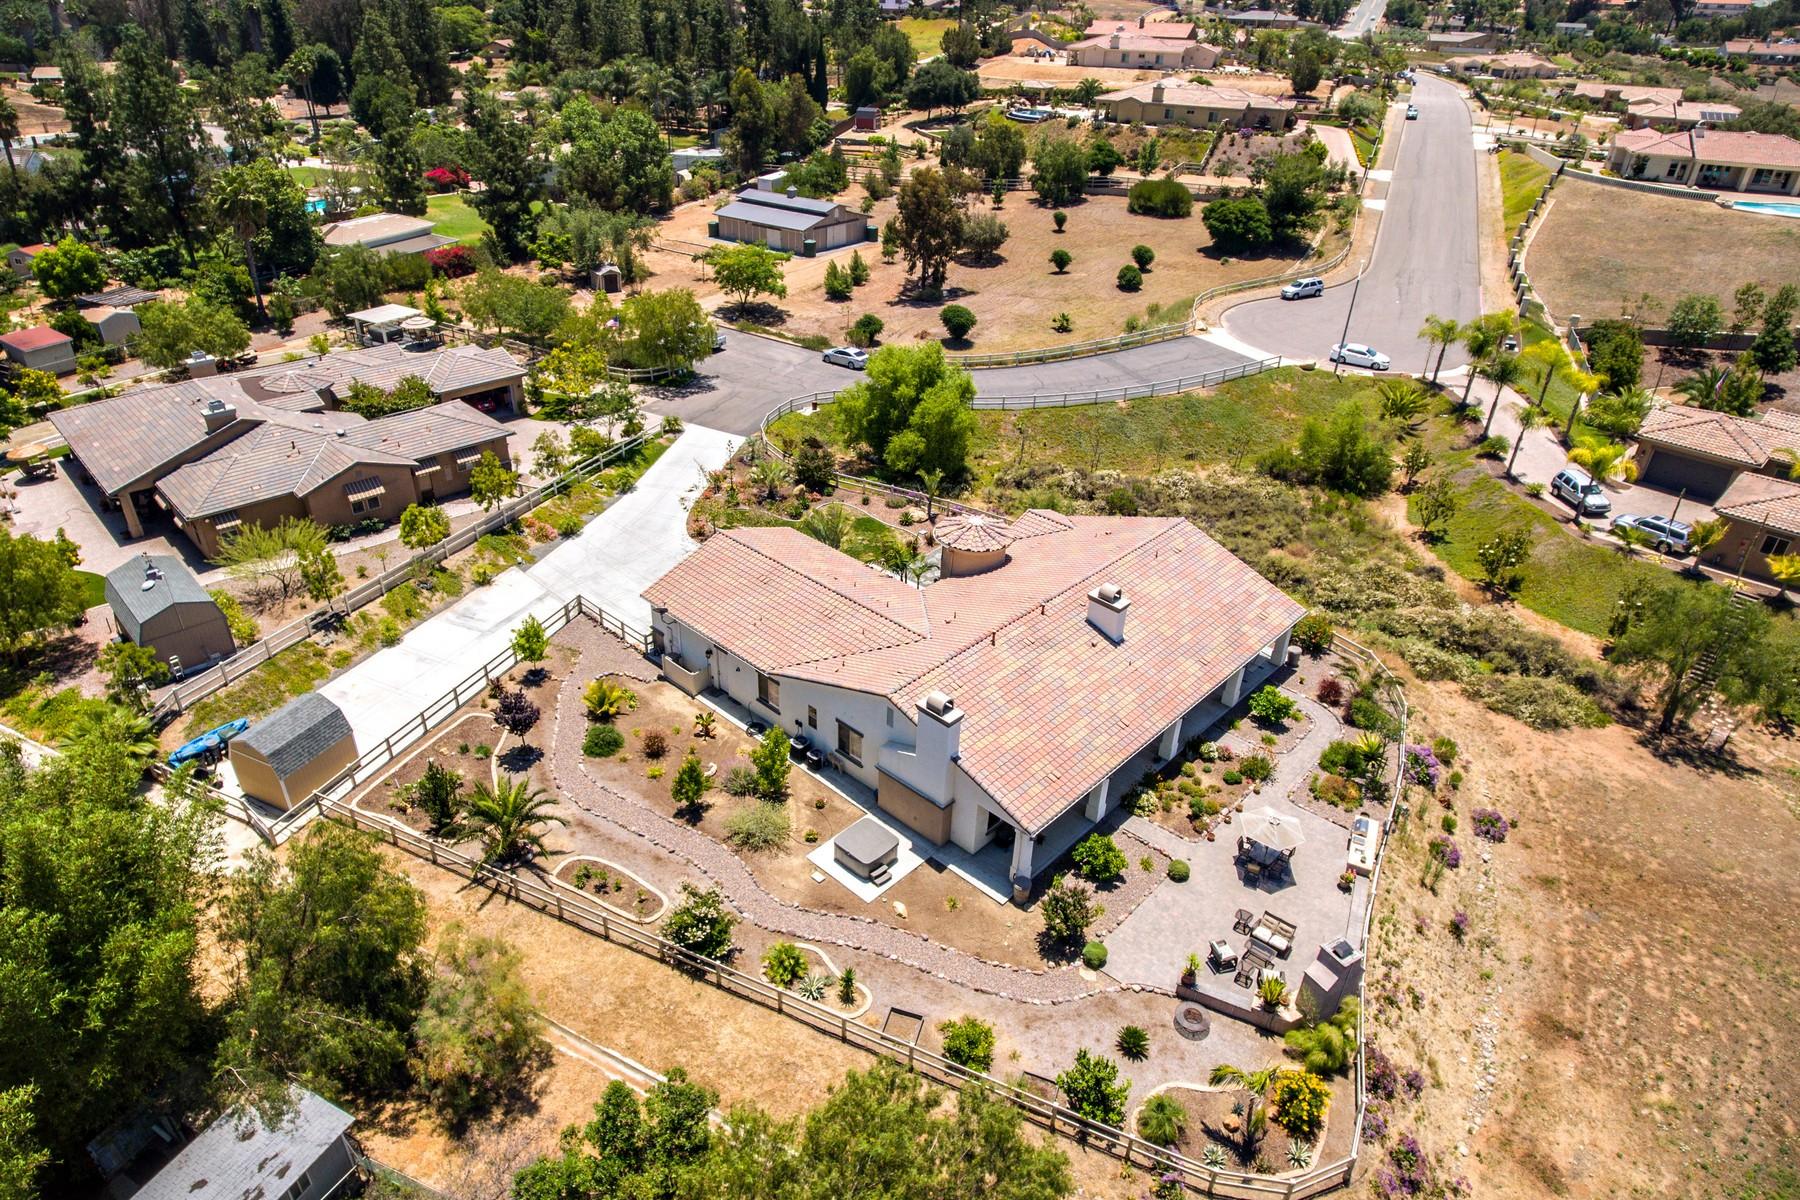 Single Family Home for Sale at 816 Liberatore Lane El Cajon, California 92019 United States